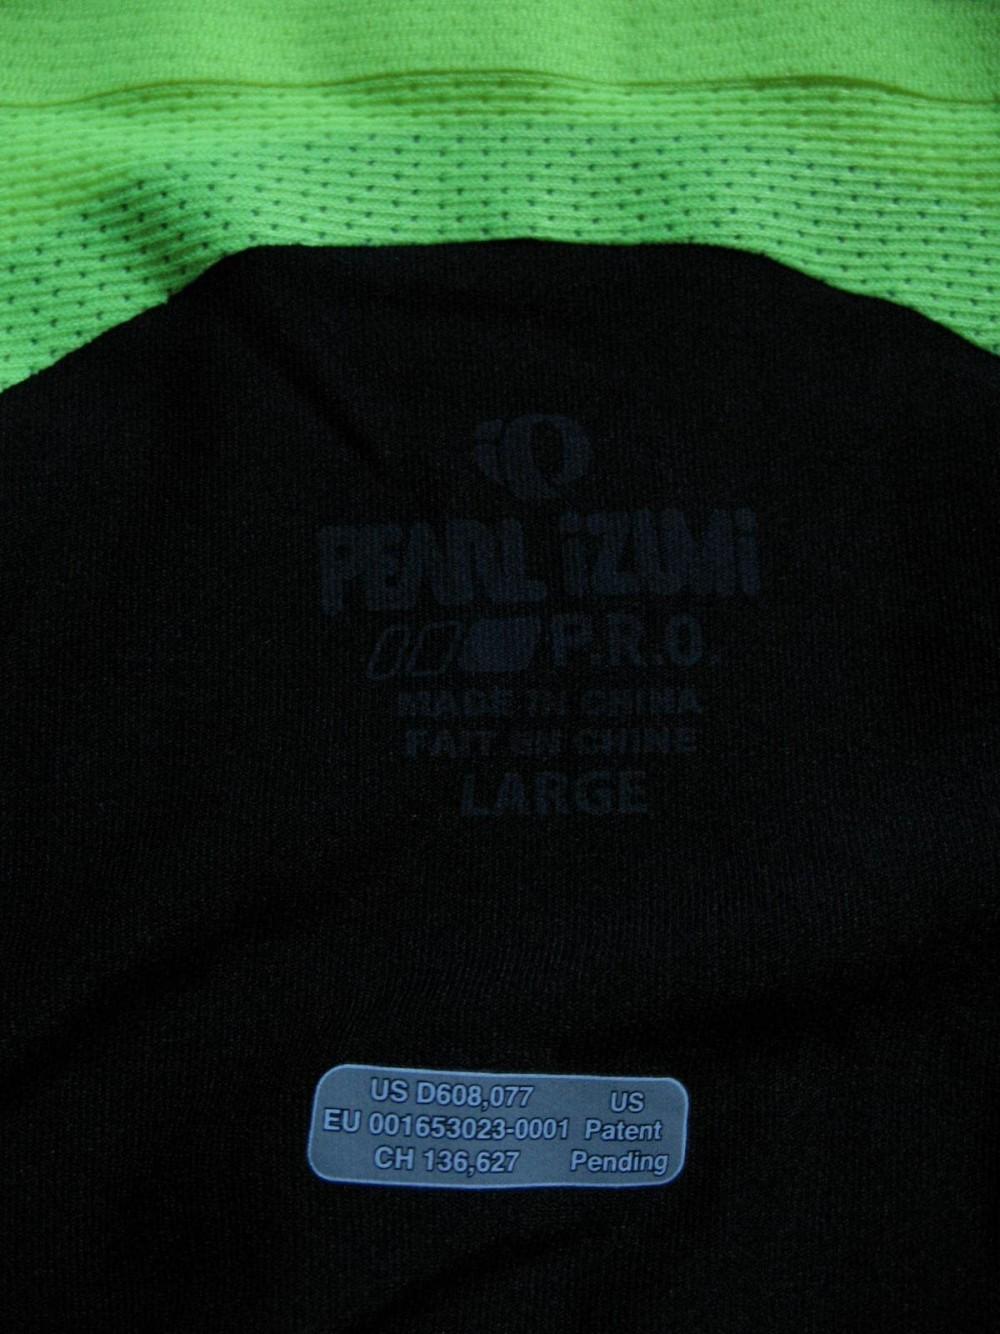 Веломайка PEARL IZUMI p.r.o. leader short sleeve jersey (размер L) - 9